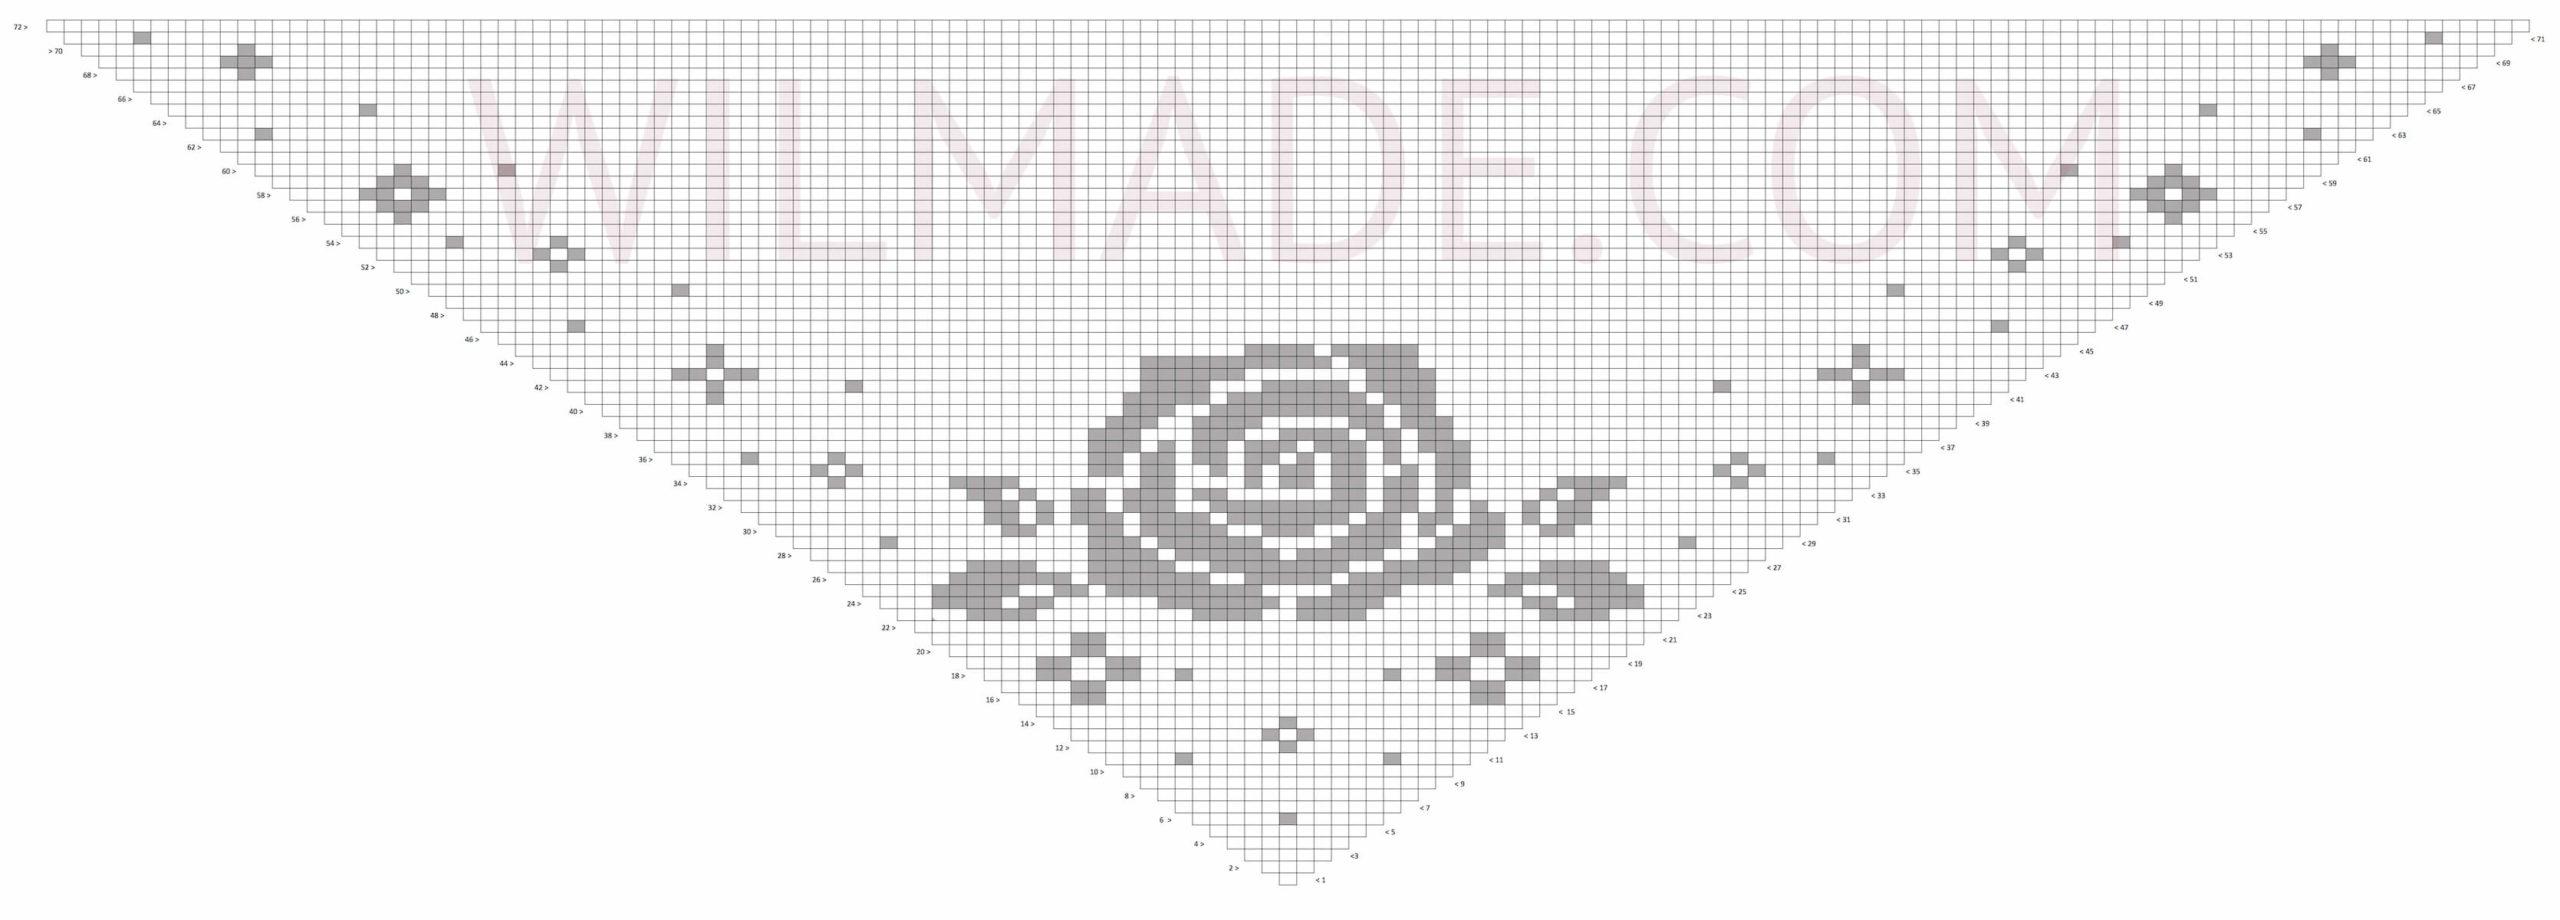 Filet crochet roses triangle shawl - free crochet pattern